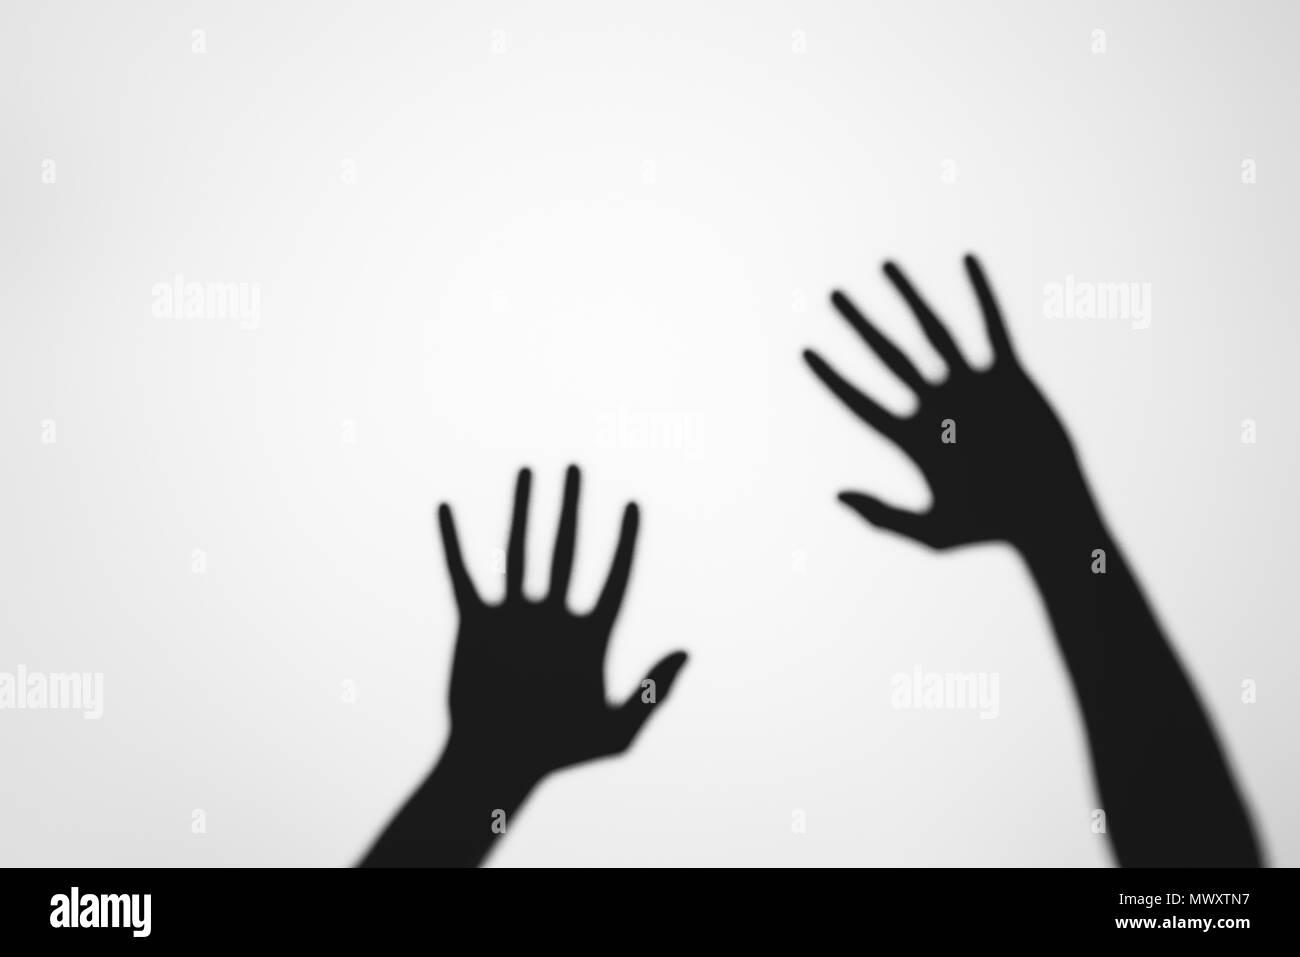 Spooky misteriosas sombras de manos humanas sobre gris Imagen De Stock